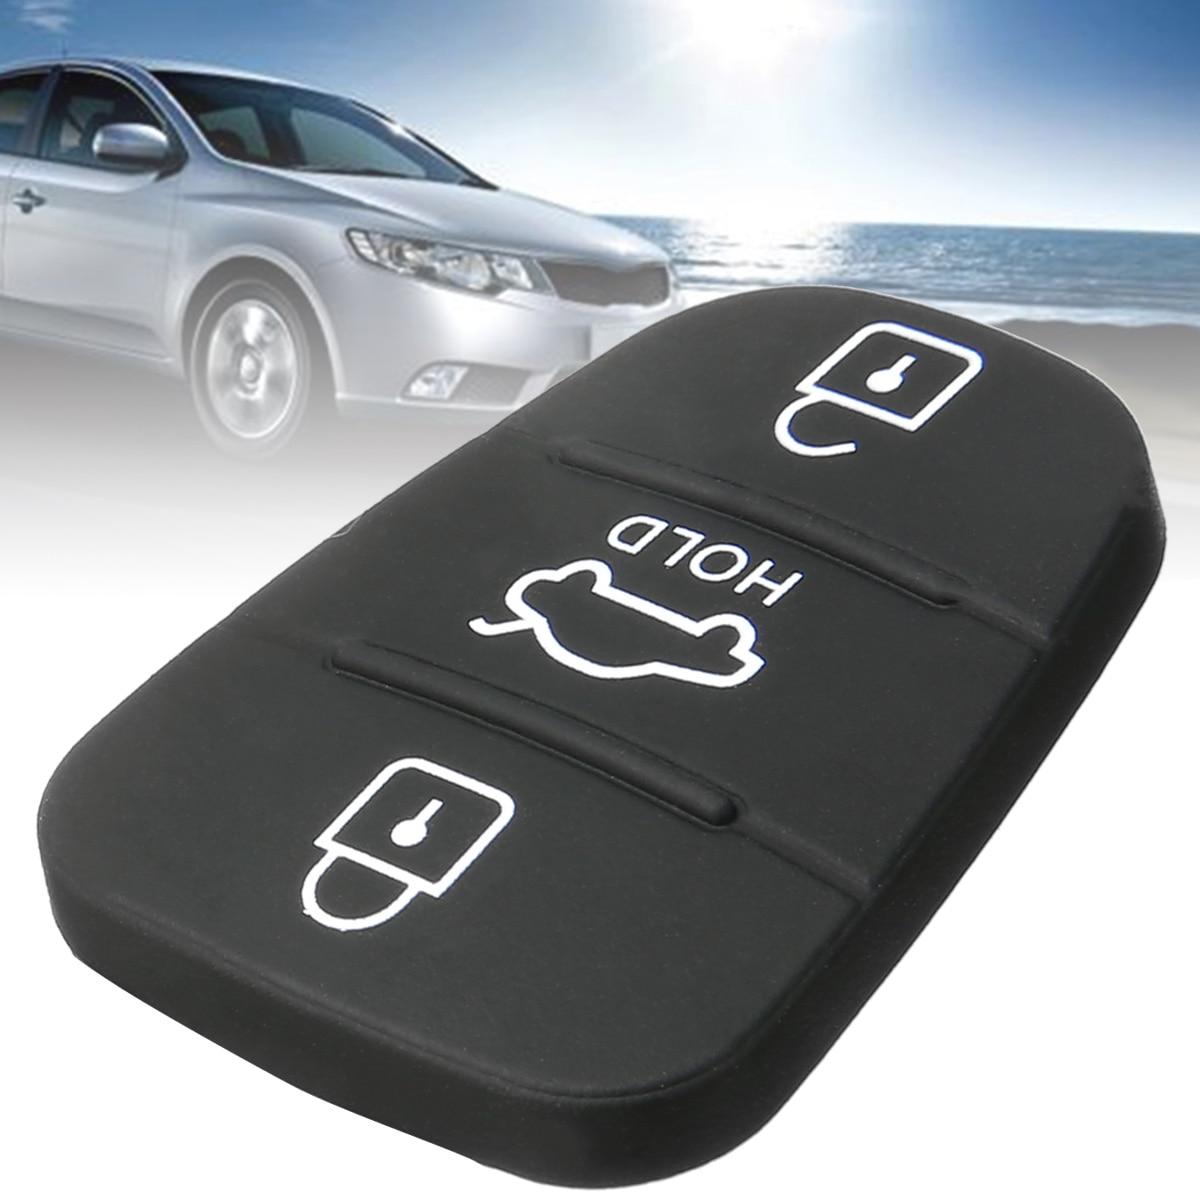 1pcs 3 Buttons Car Key Pad Flip Key For Hyundai i20 i30 Kia Solaris Rio Sorento Sportage Ceed